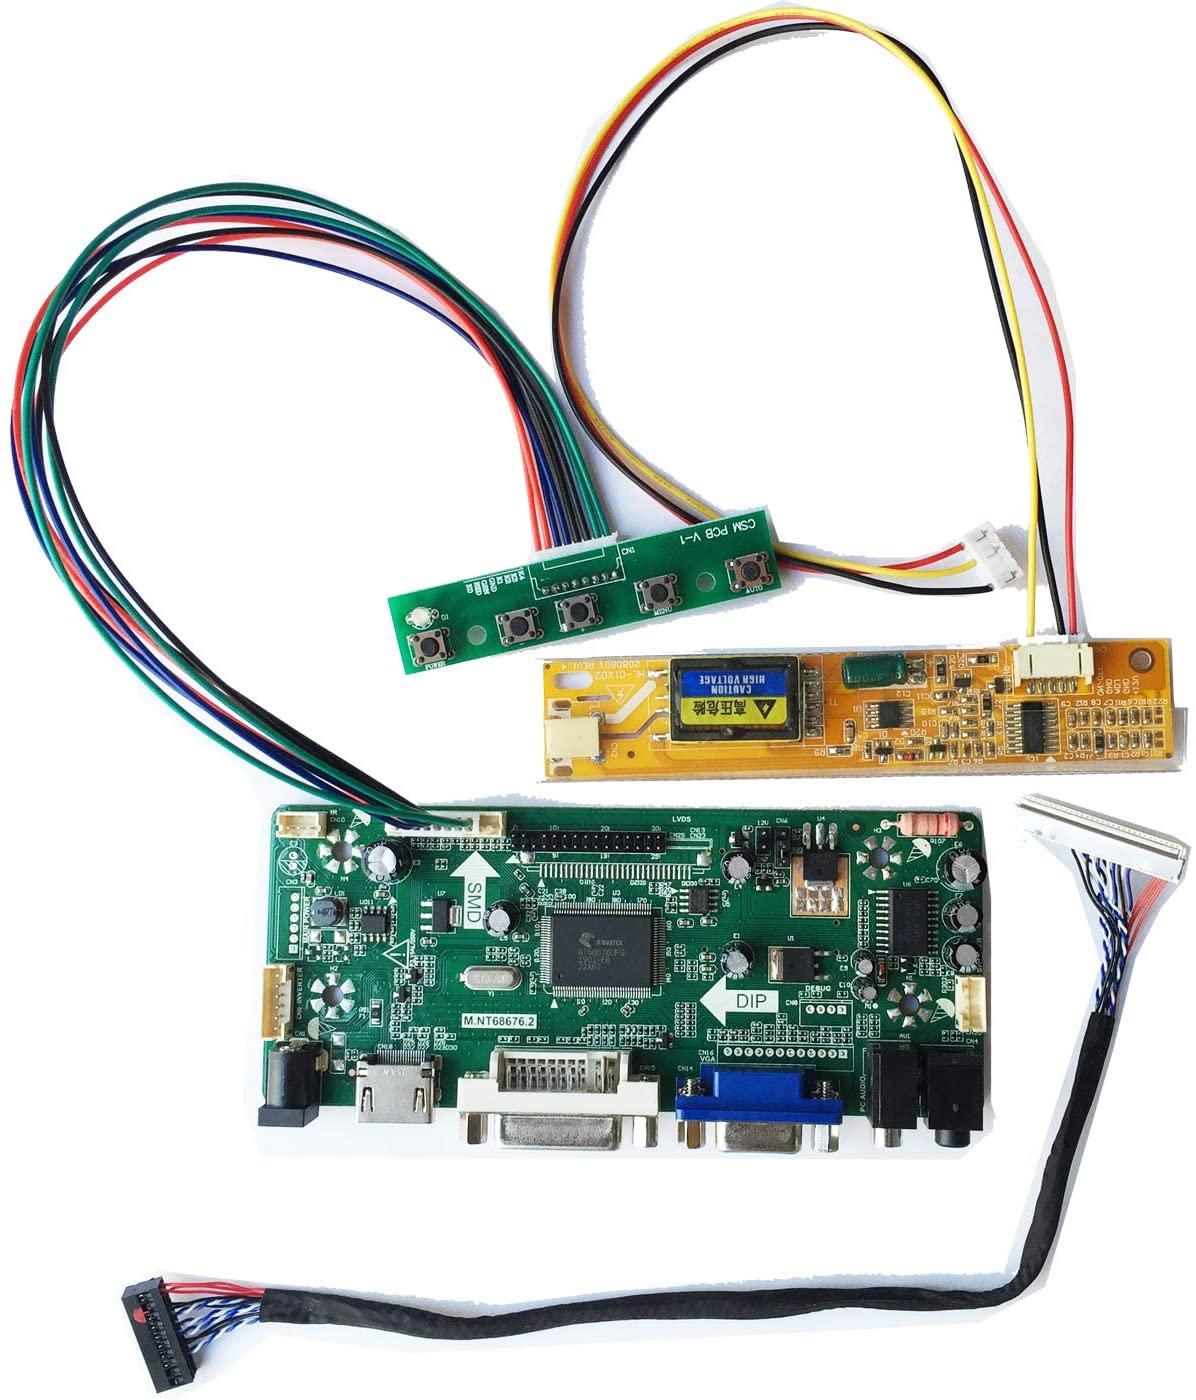 HDMI+DVI+VGA+Audio LCD Panel Controller Converter Kit for LP154W01(A1) 1280X800